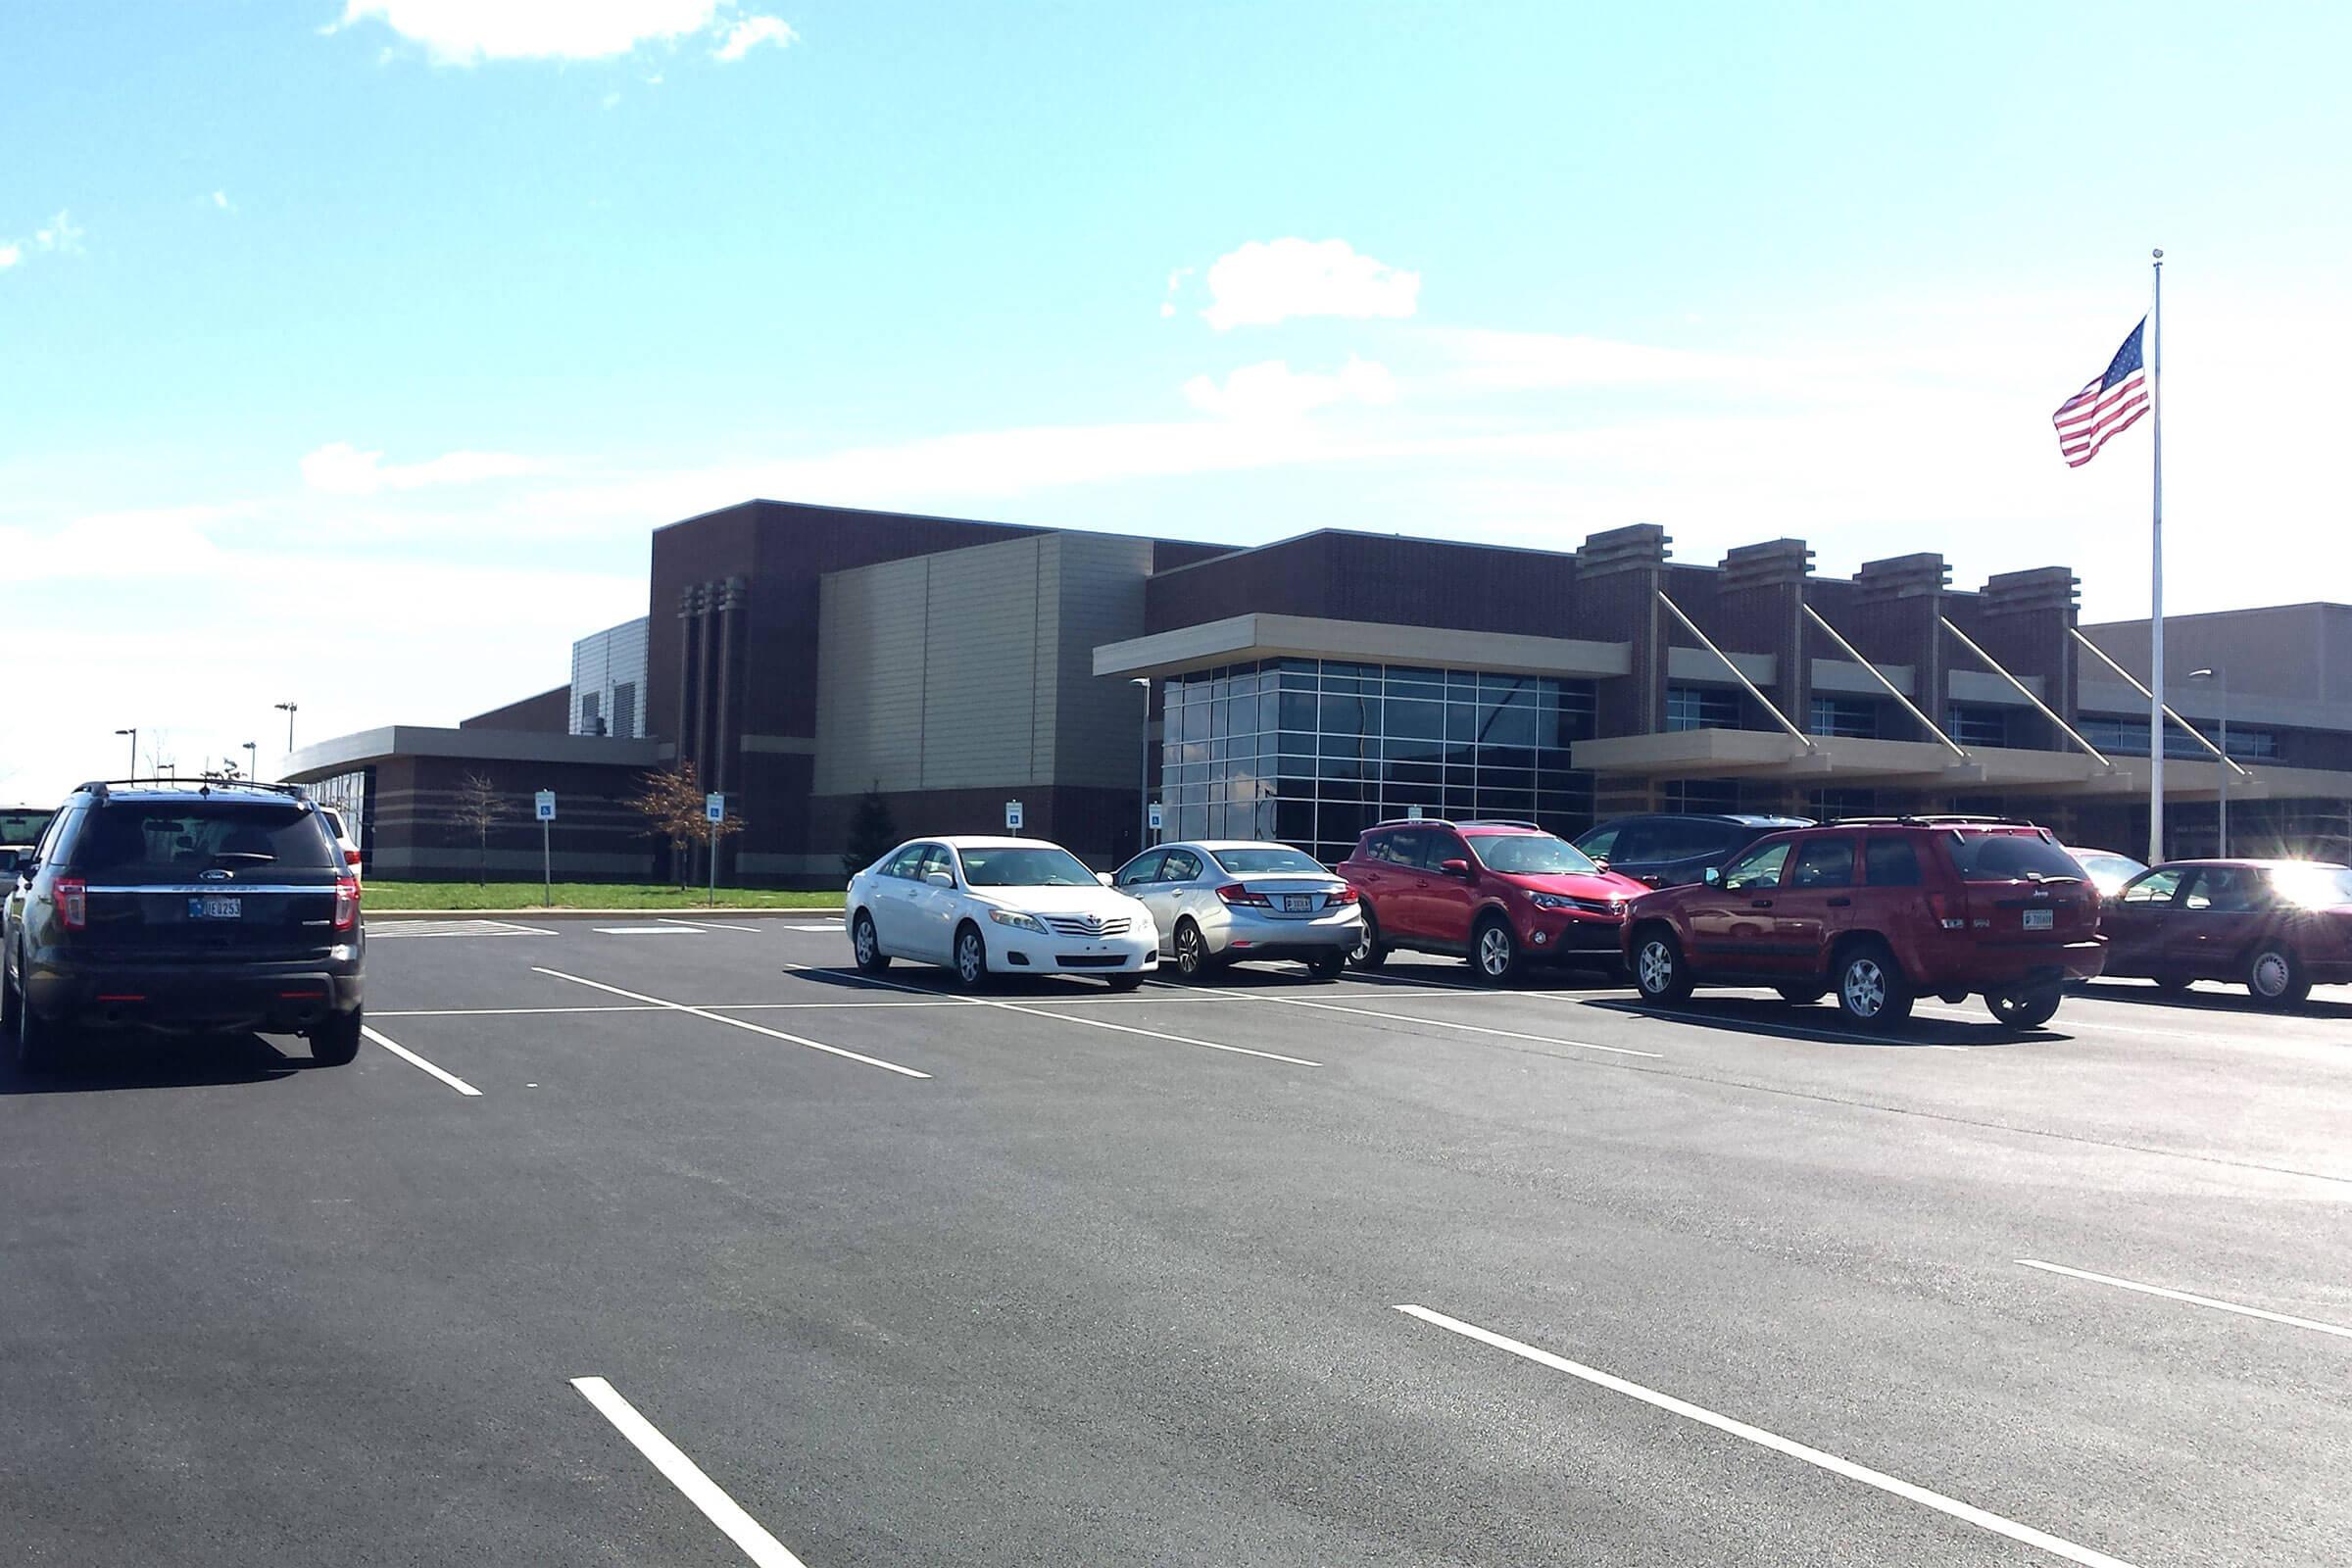 brooklyn center parking lot paving